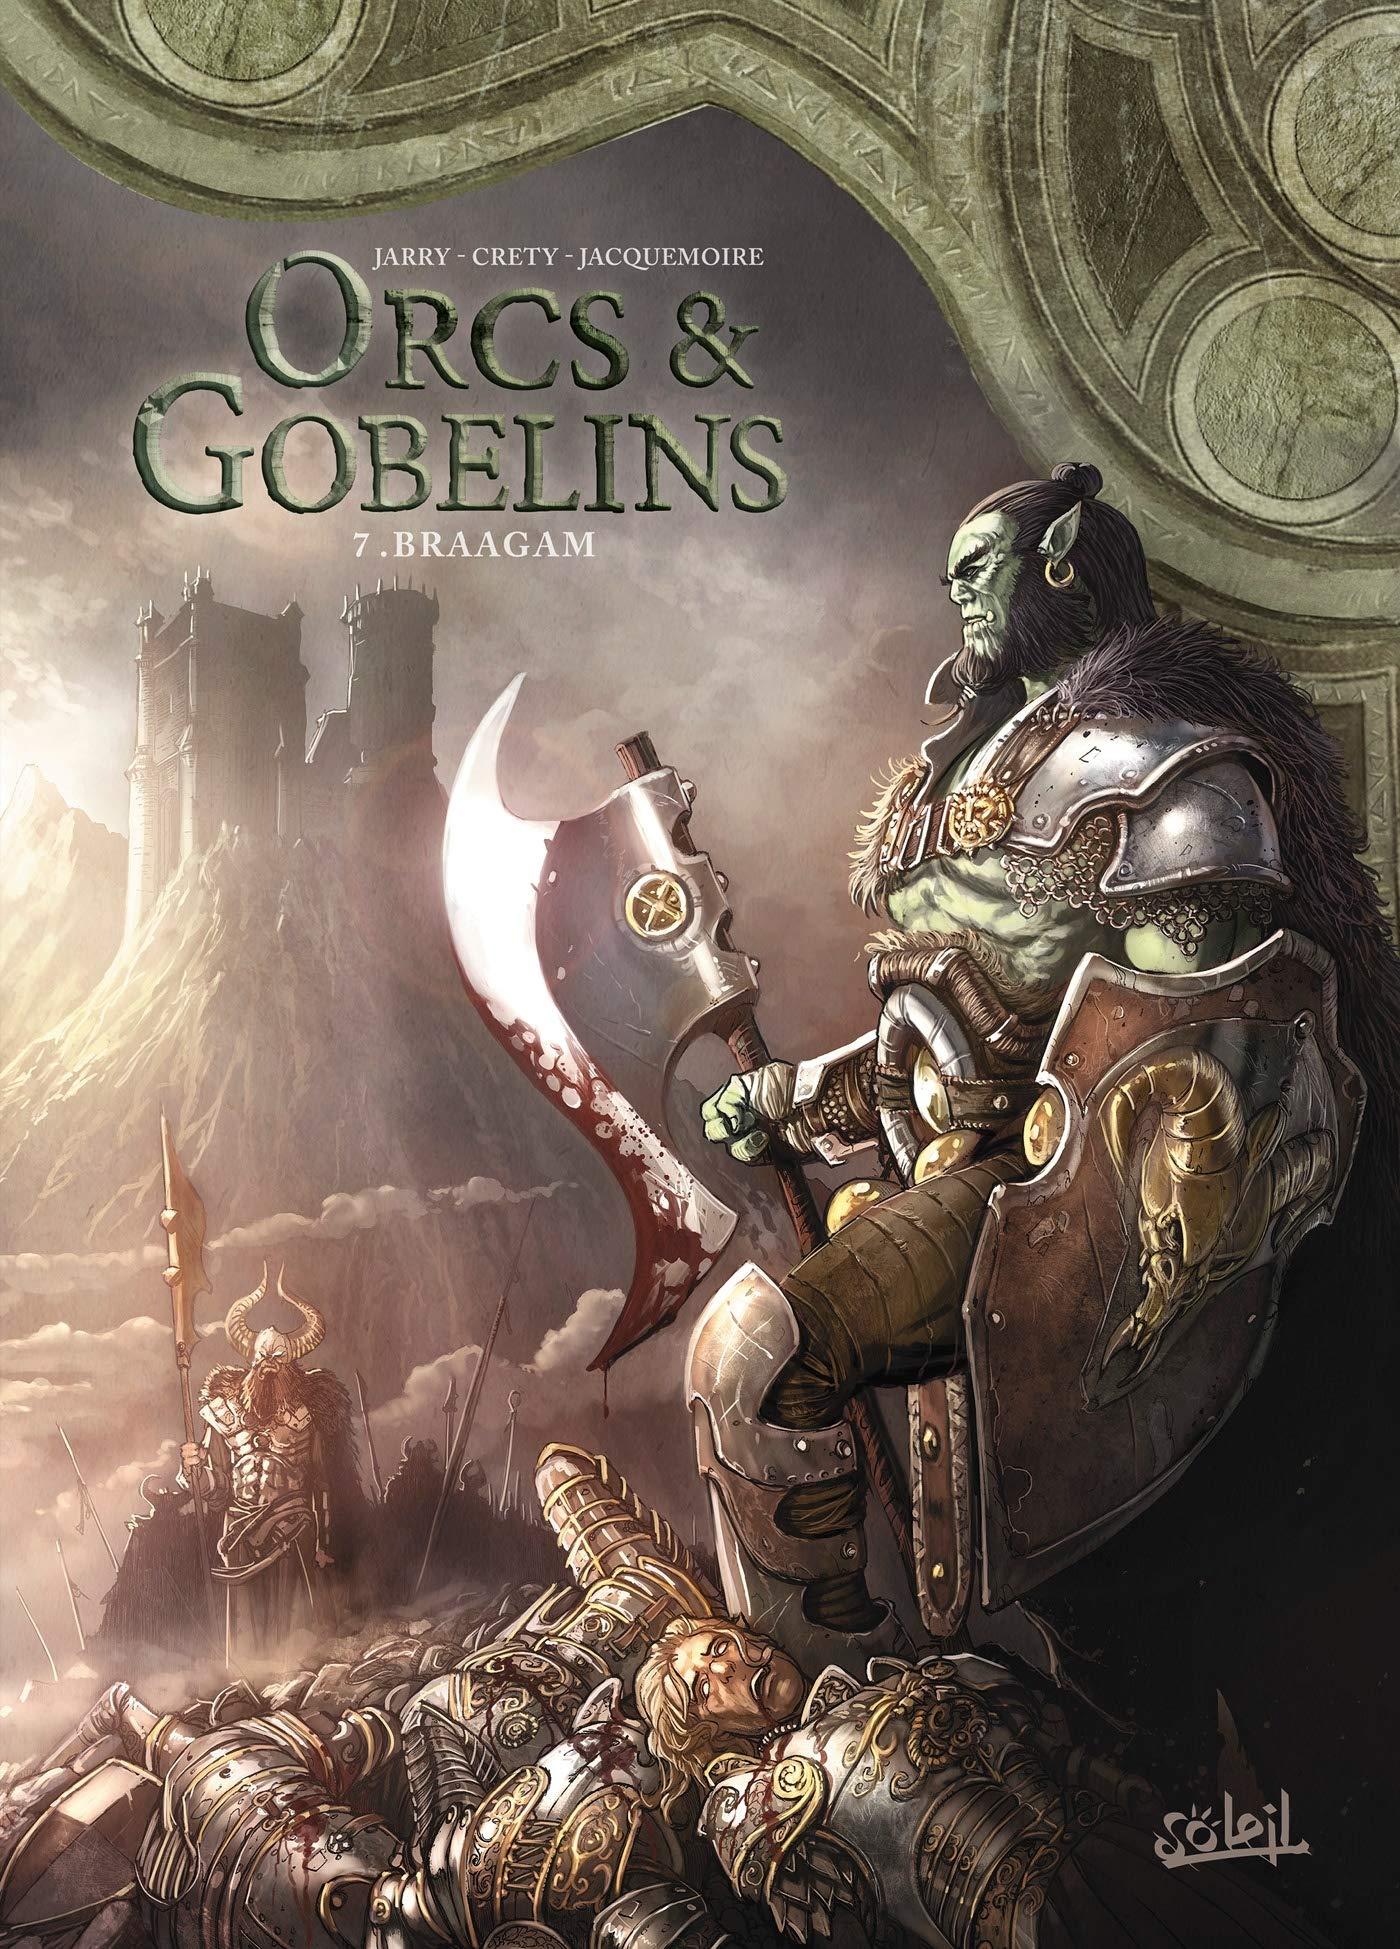 Orcs et Gobelins 7 - Braagam